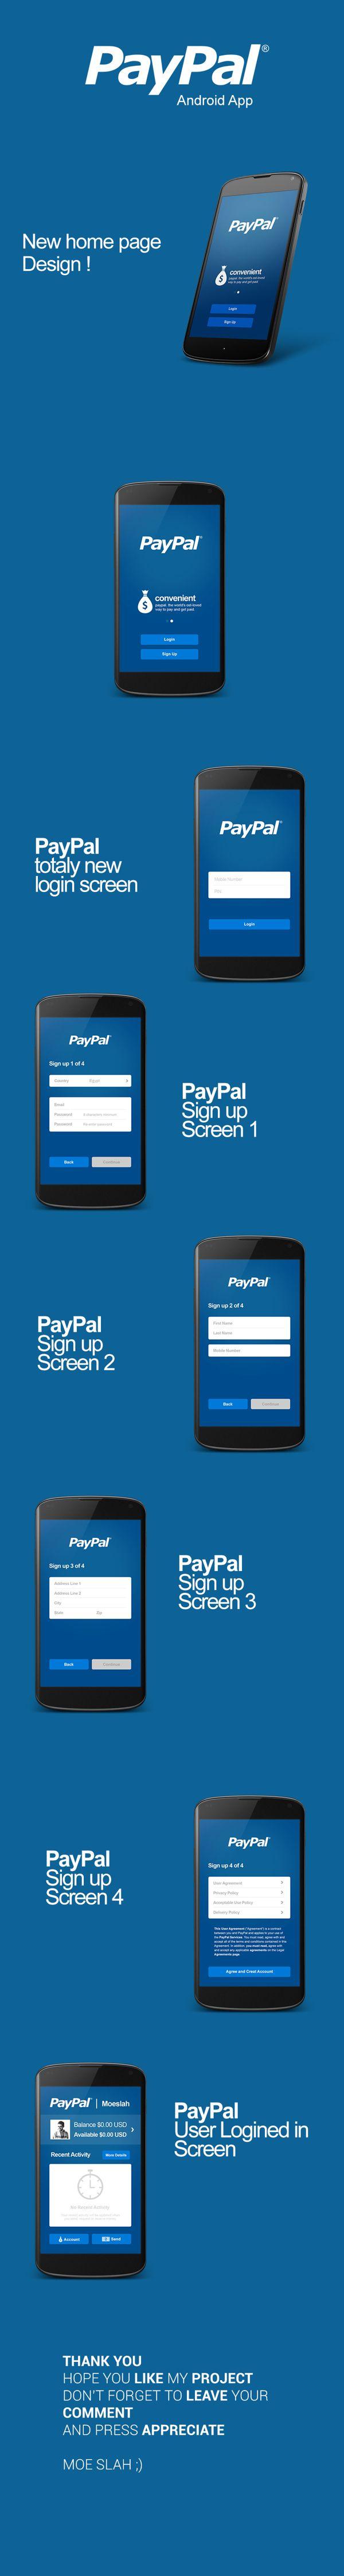 PayPal Android App UI design by Moe slah, via Behance